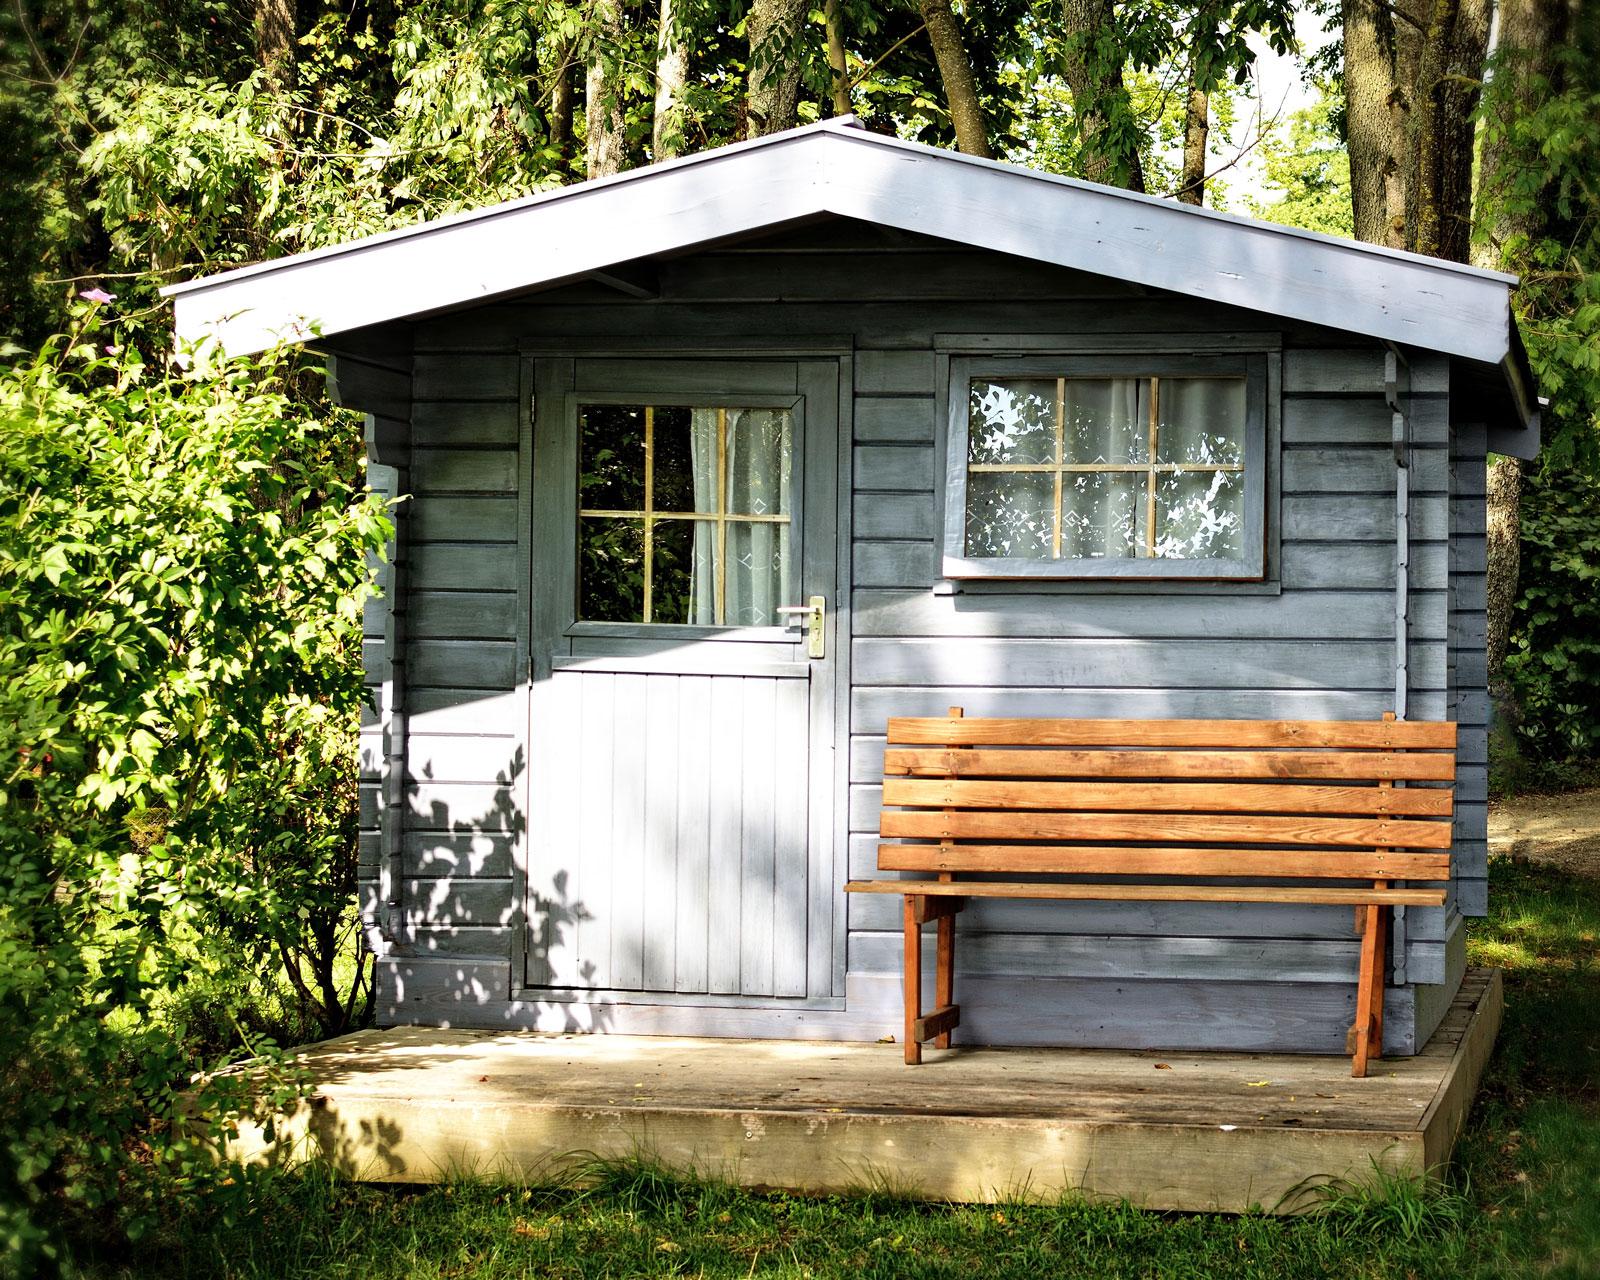 installer un abri de jardin, un carport ou garage... - La Couture